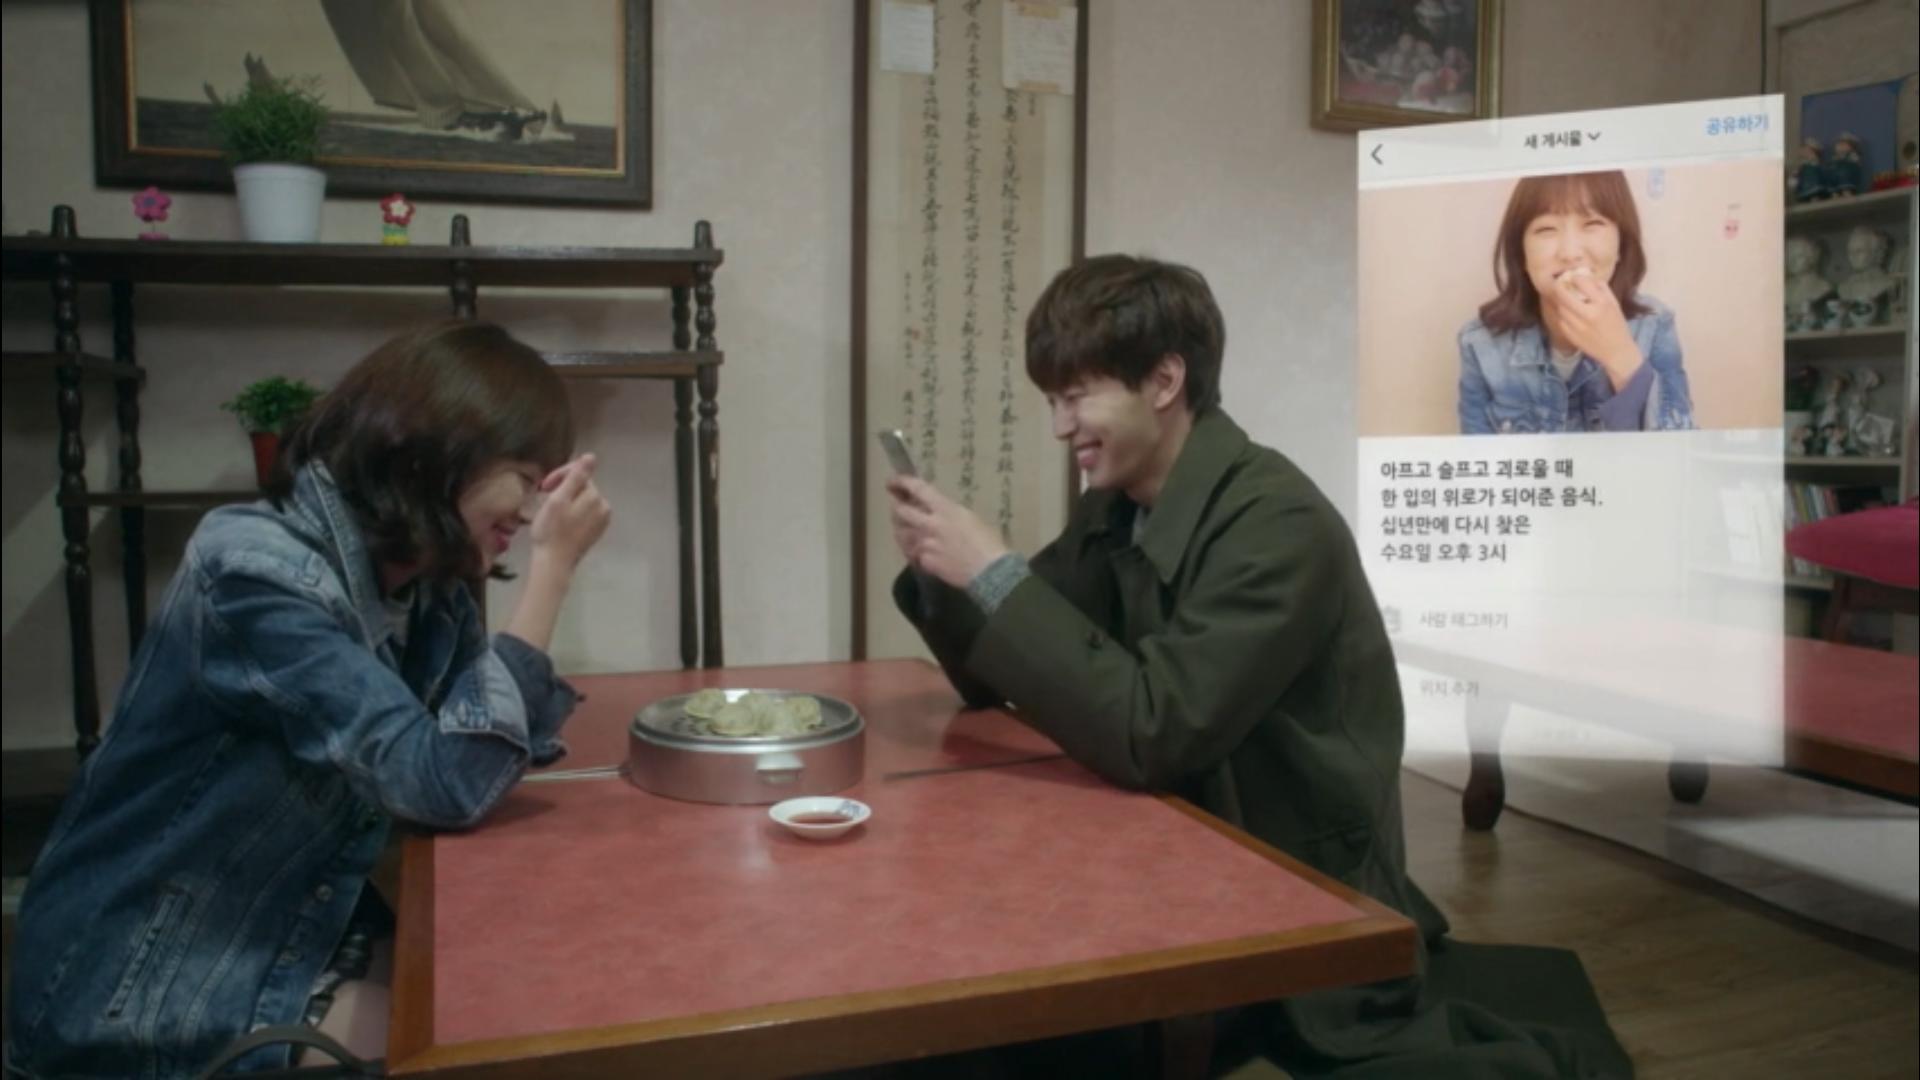 Wednesday 3:30 PM Seon Eun-woo and Yoon Jae-won dumpling date